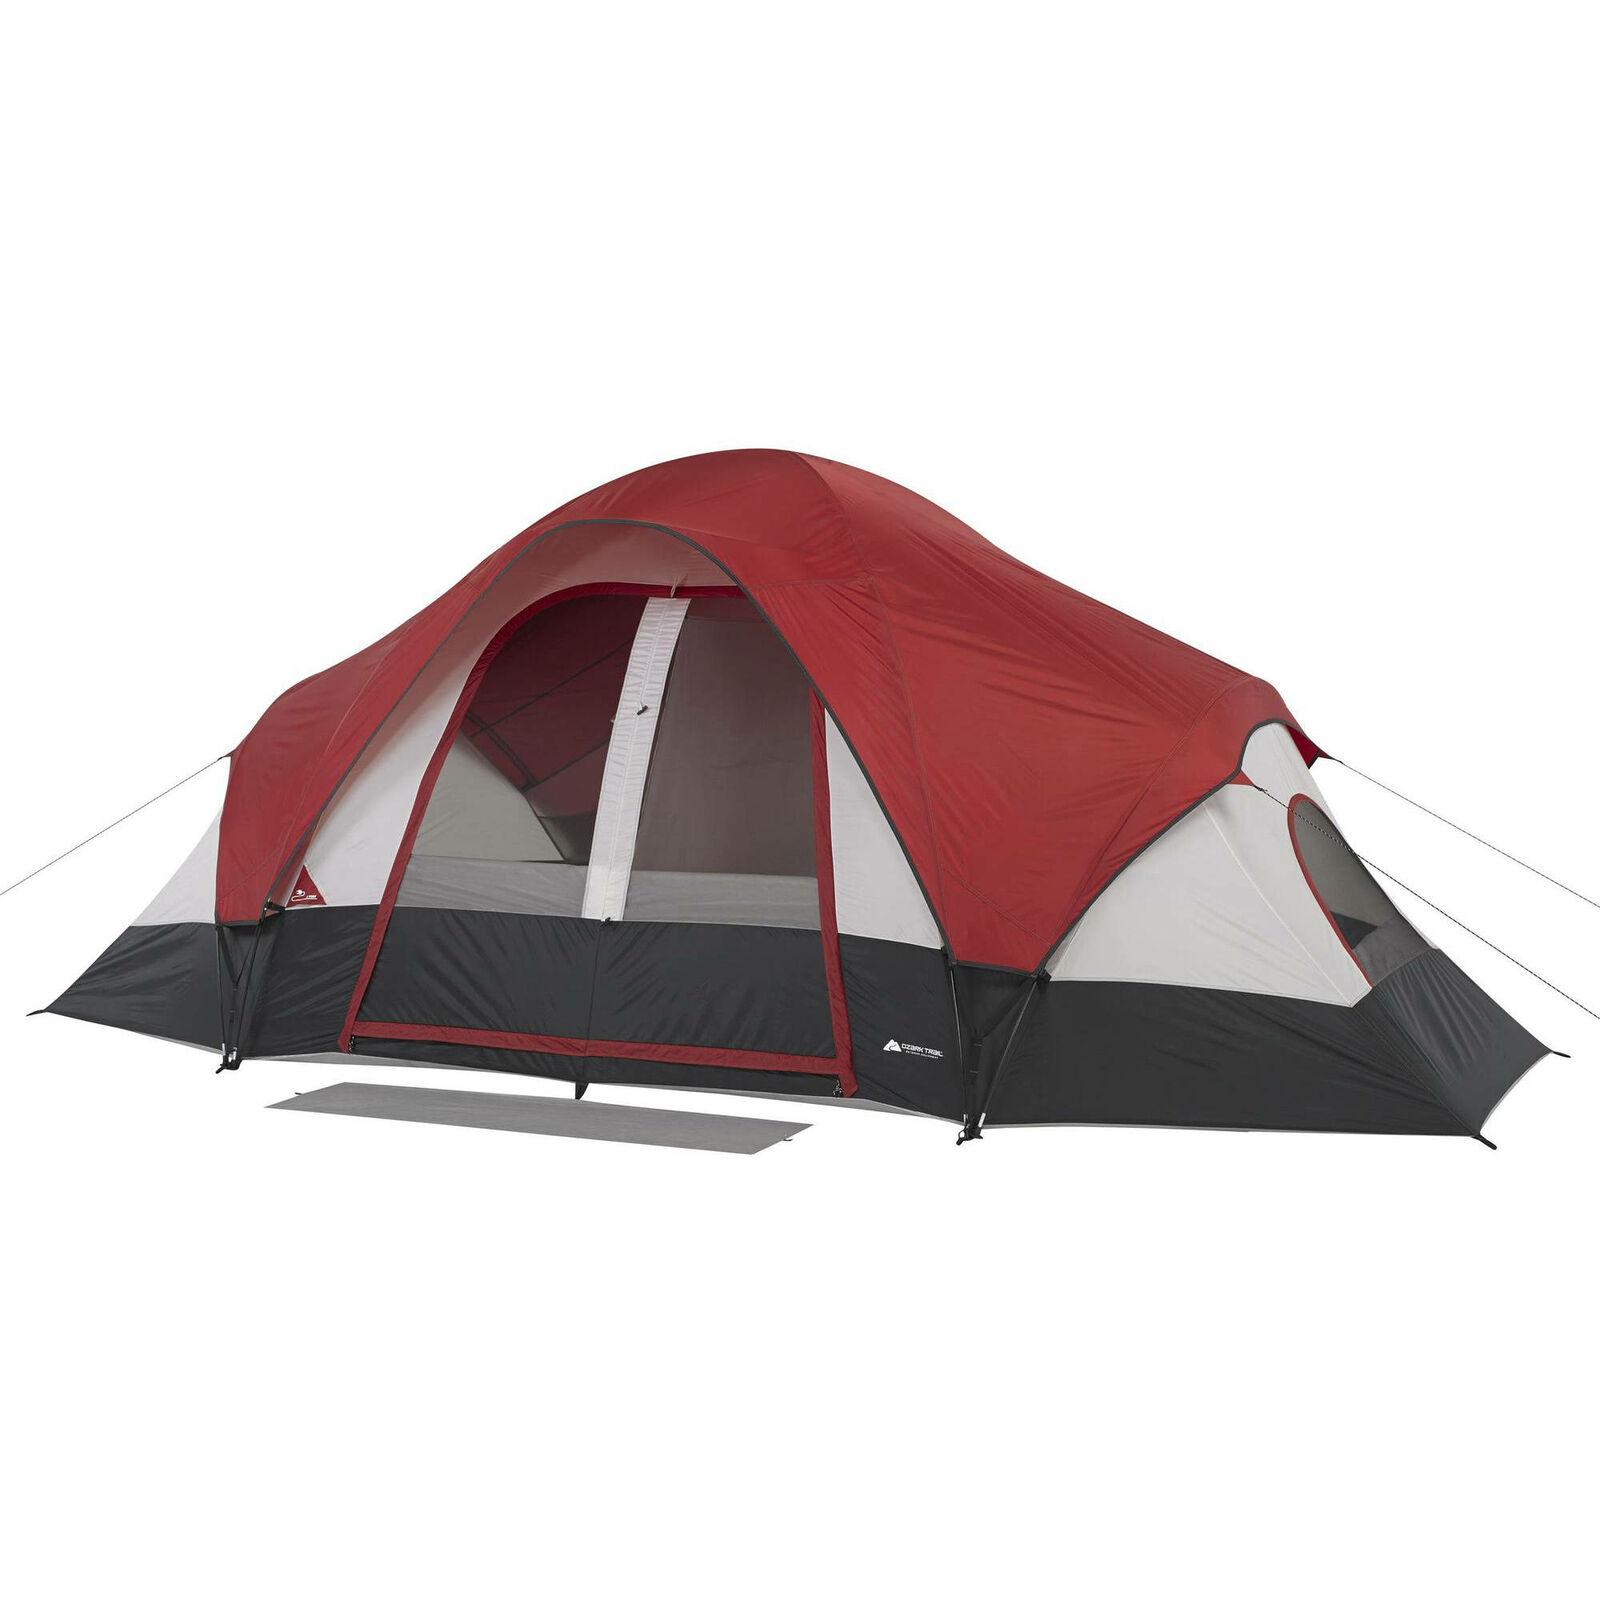 Ozark Trail cúpula de la familia de 8 personas Camping cabina posterior ventana construido en barro MAT